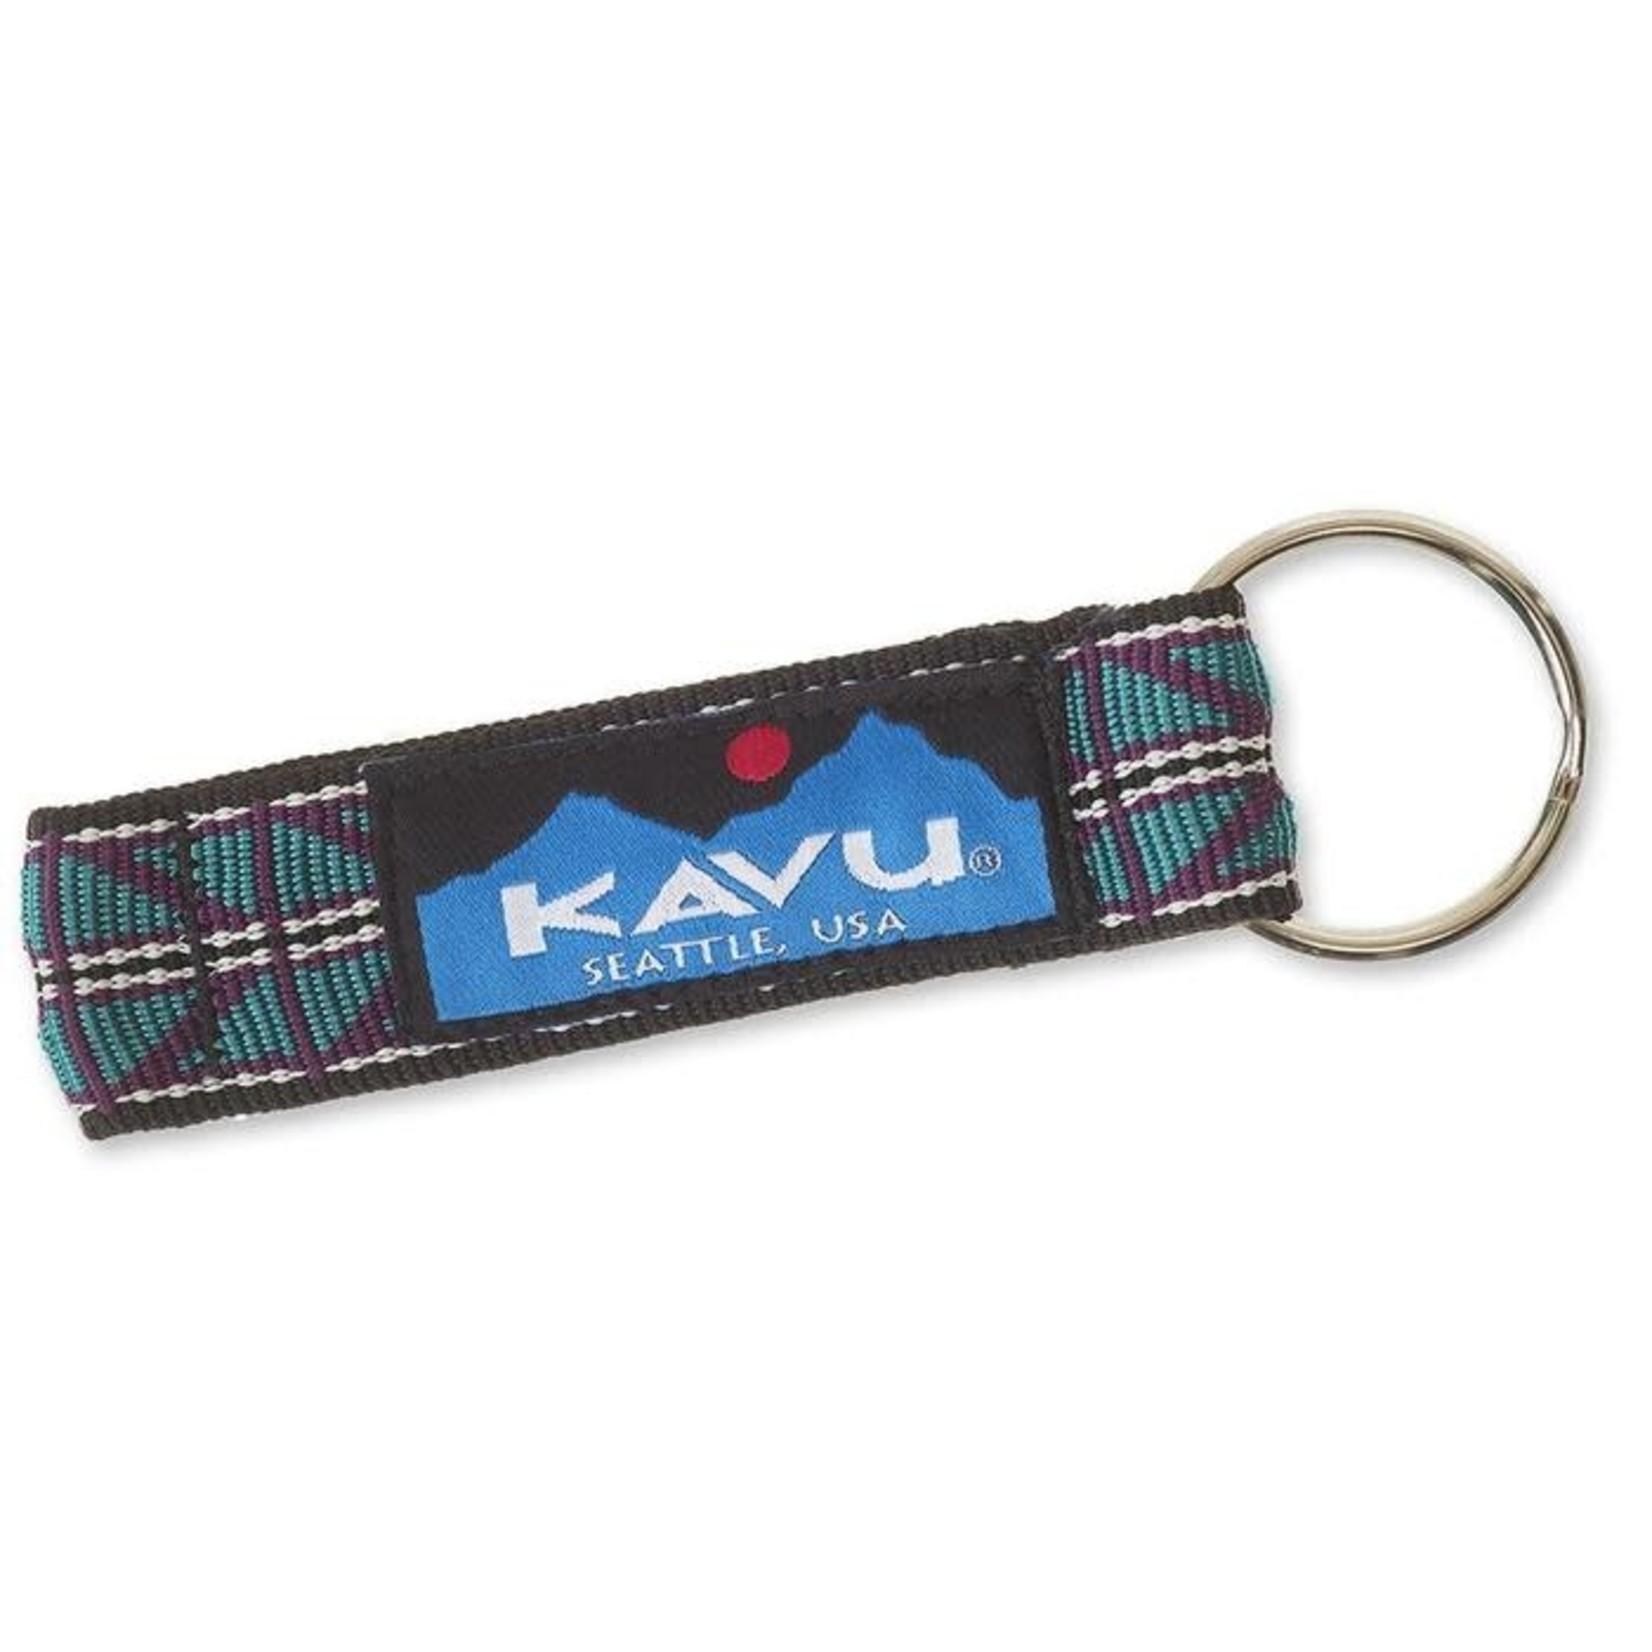 Kavu Key Chain - Purple Arrow